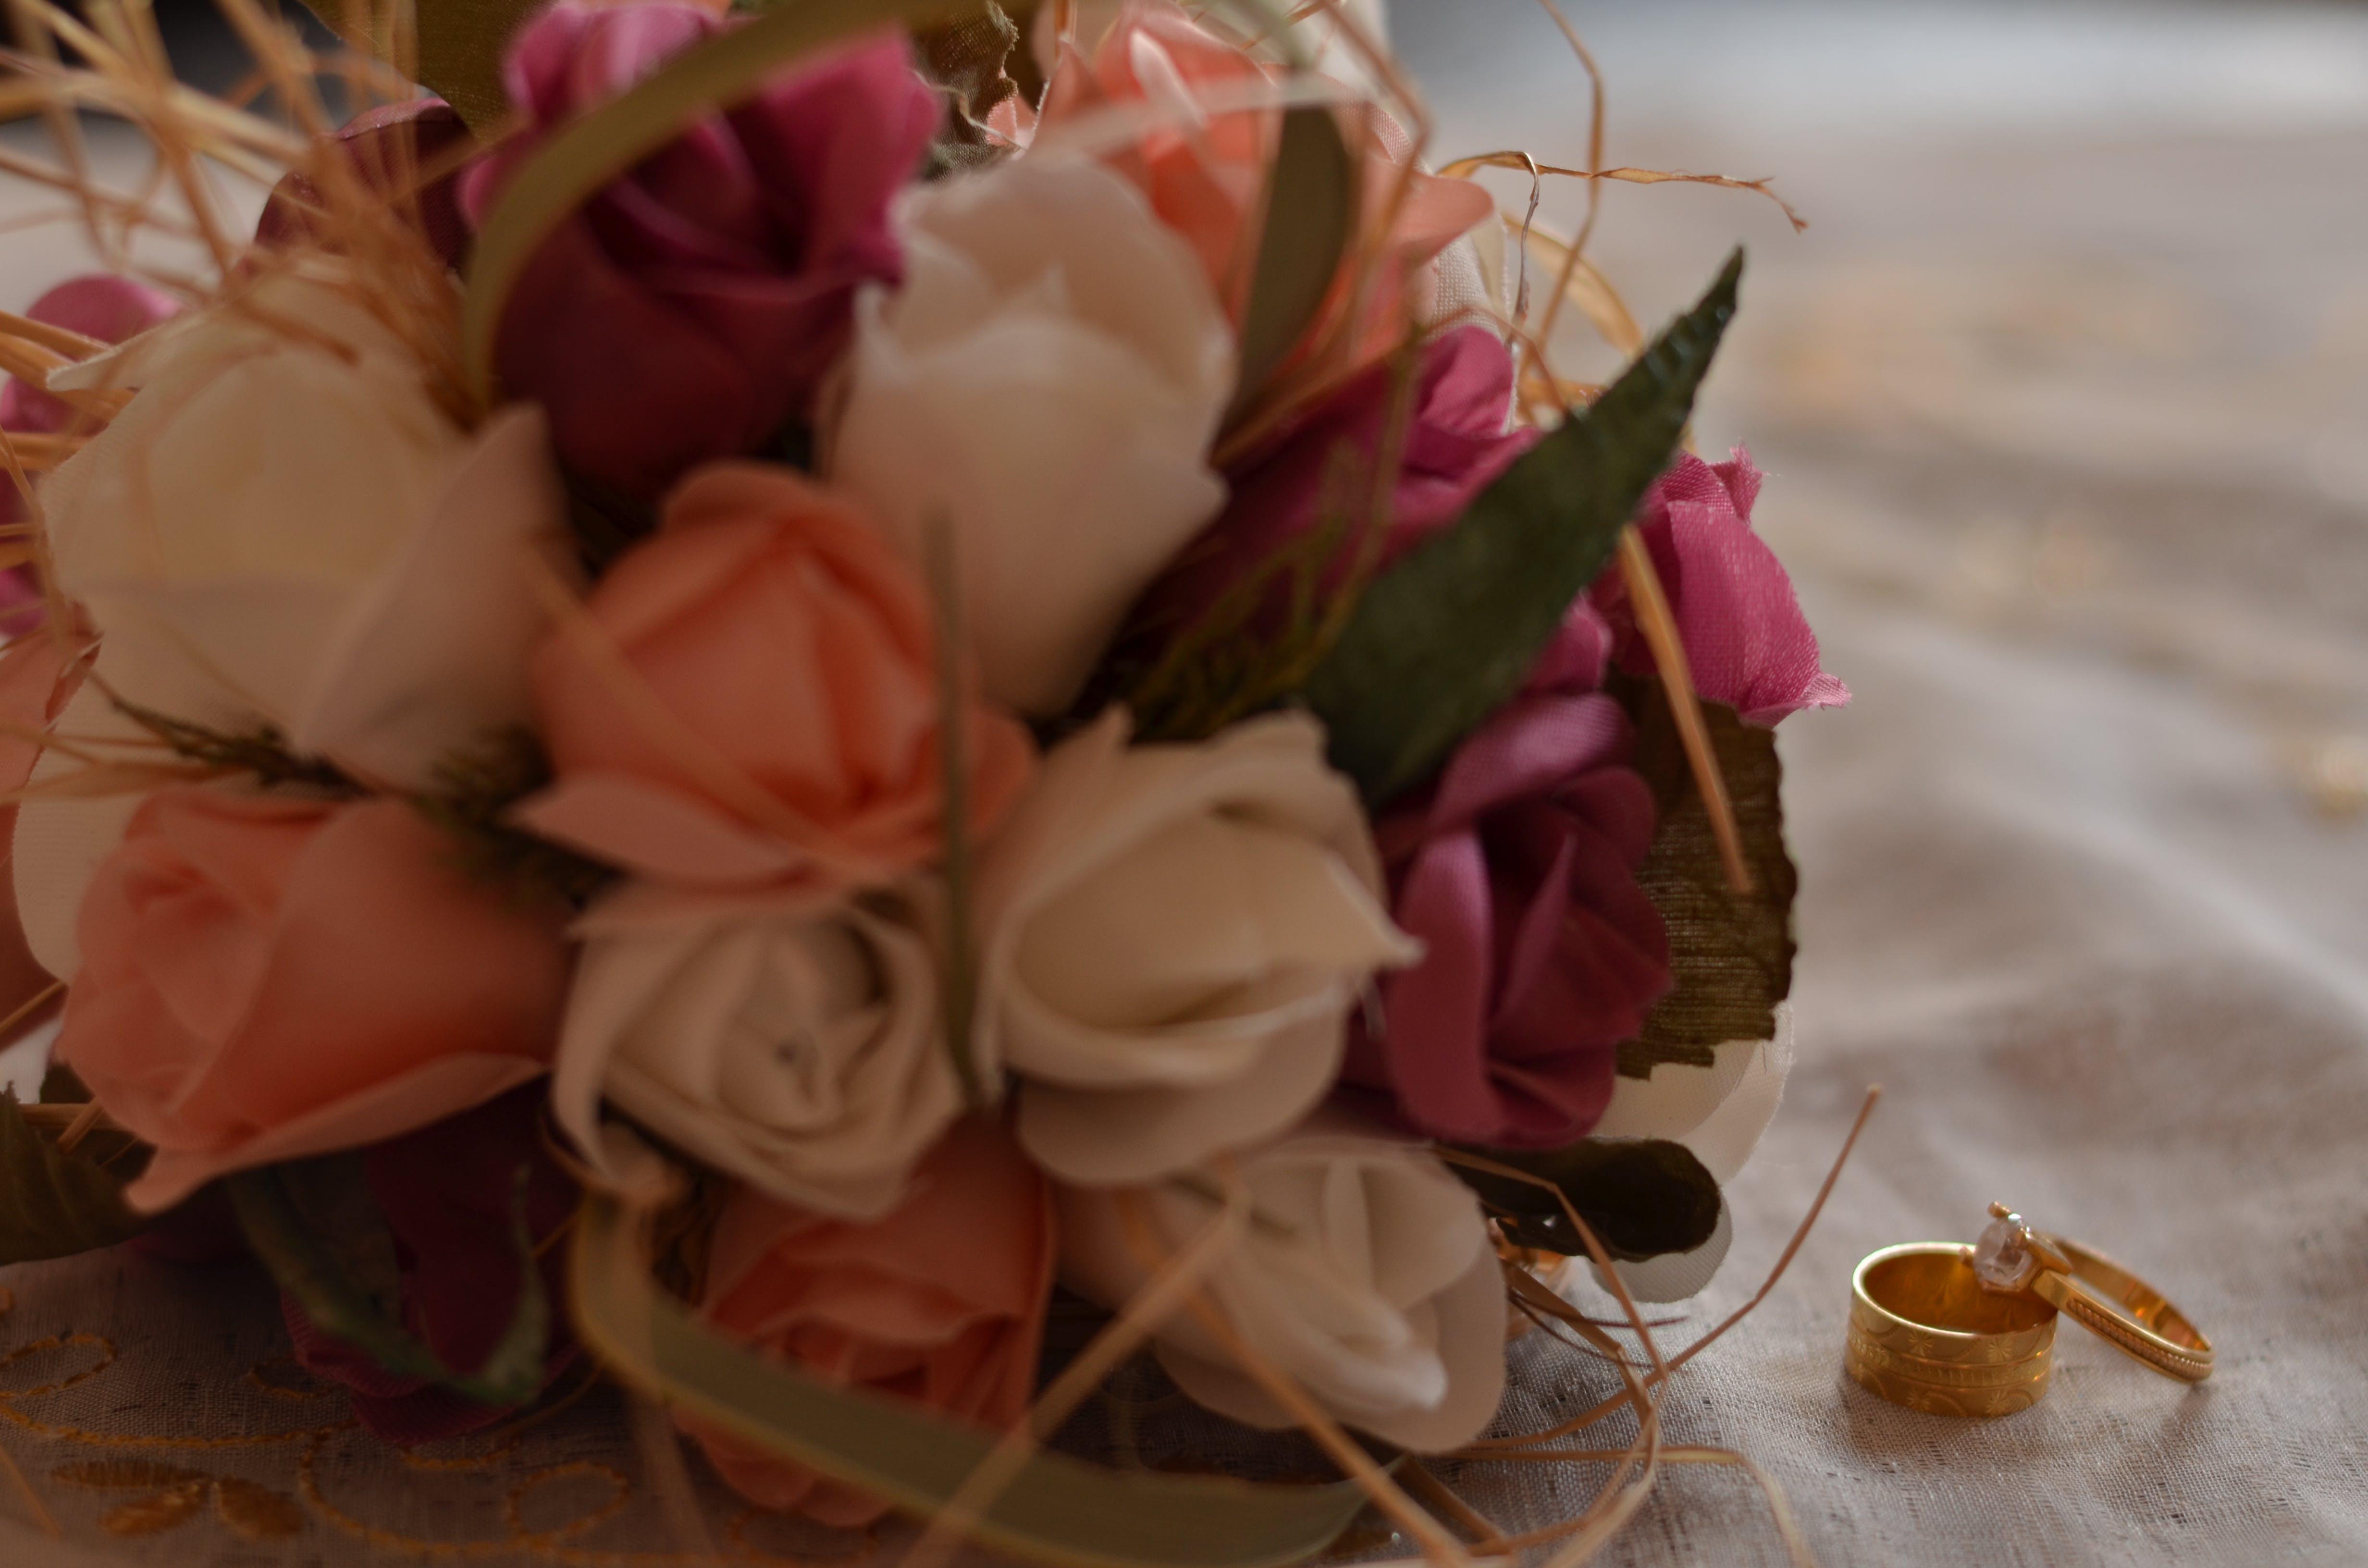 Free stock photo of pre-wedding, wedding, wedding day, wedding flowers